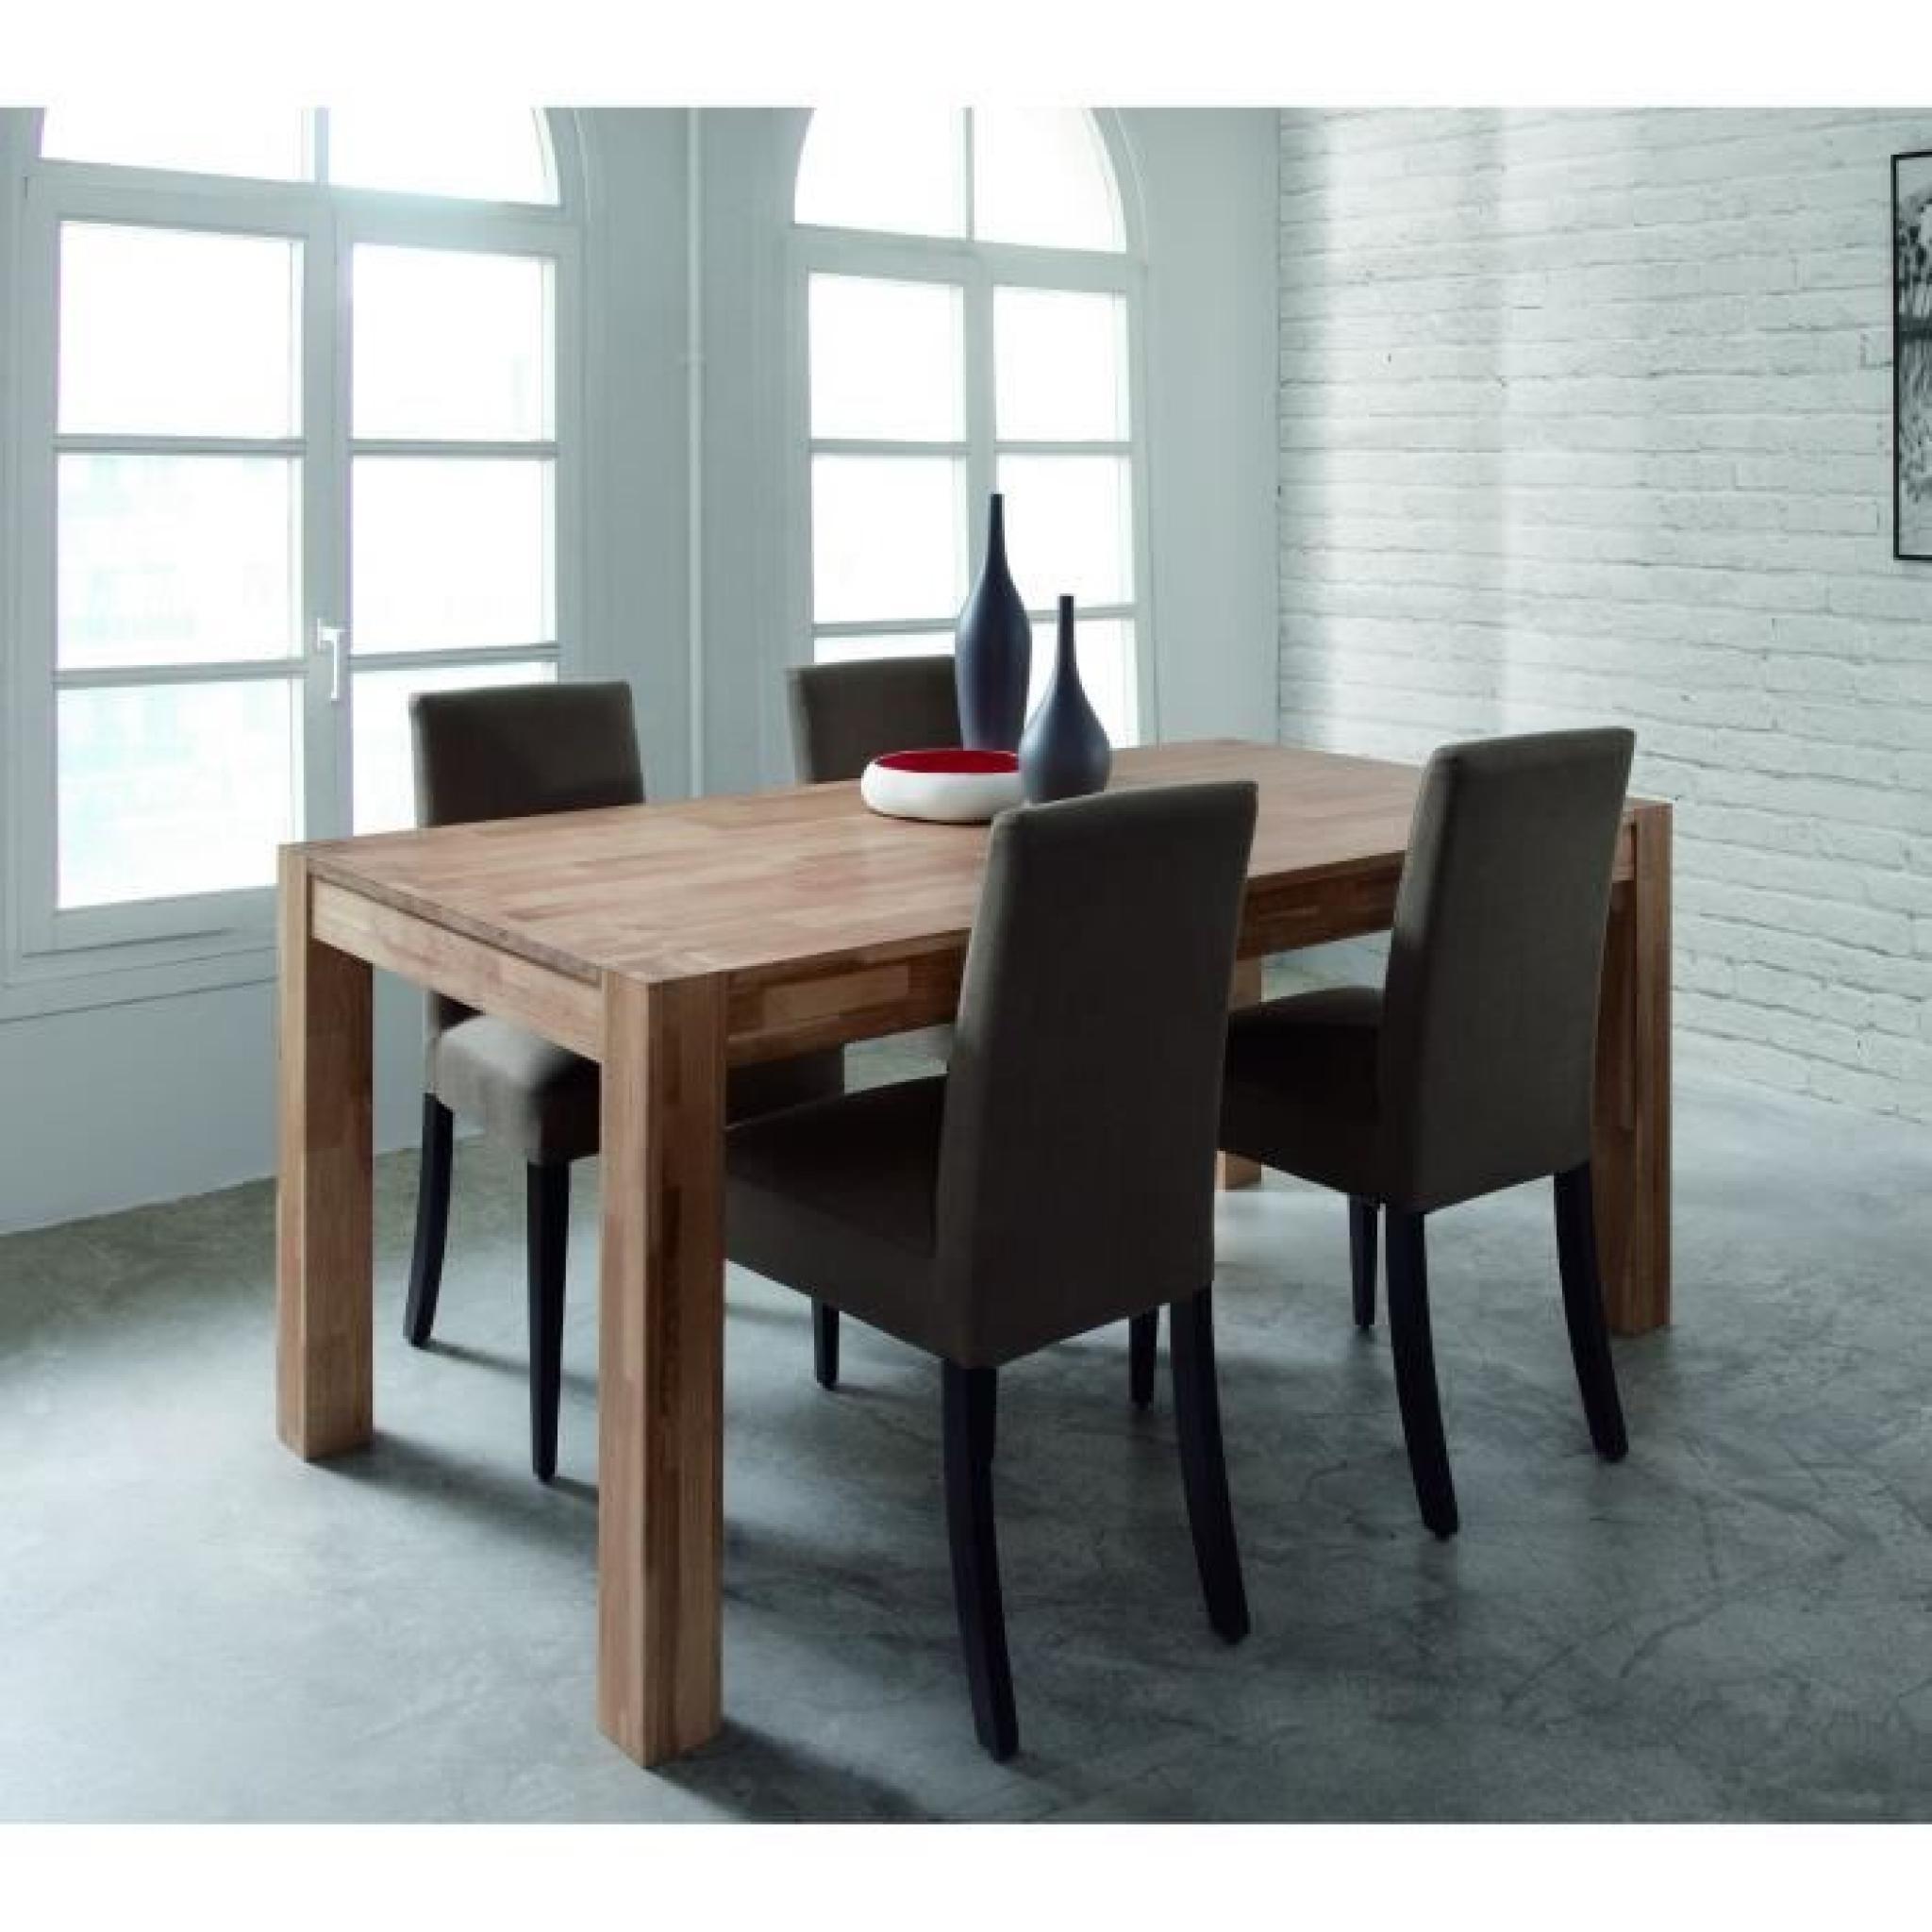 #5D4033 MILES Table Extensible Chêne Massif 150/230cm Achat  4153 vente salle a manger chene massif 2048x2048 px @ aertt.com